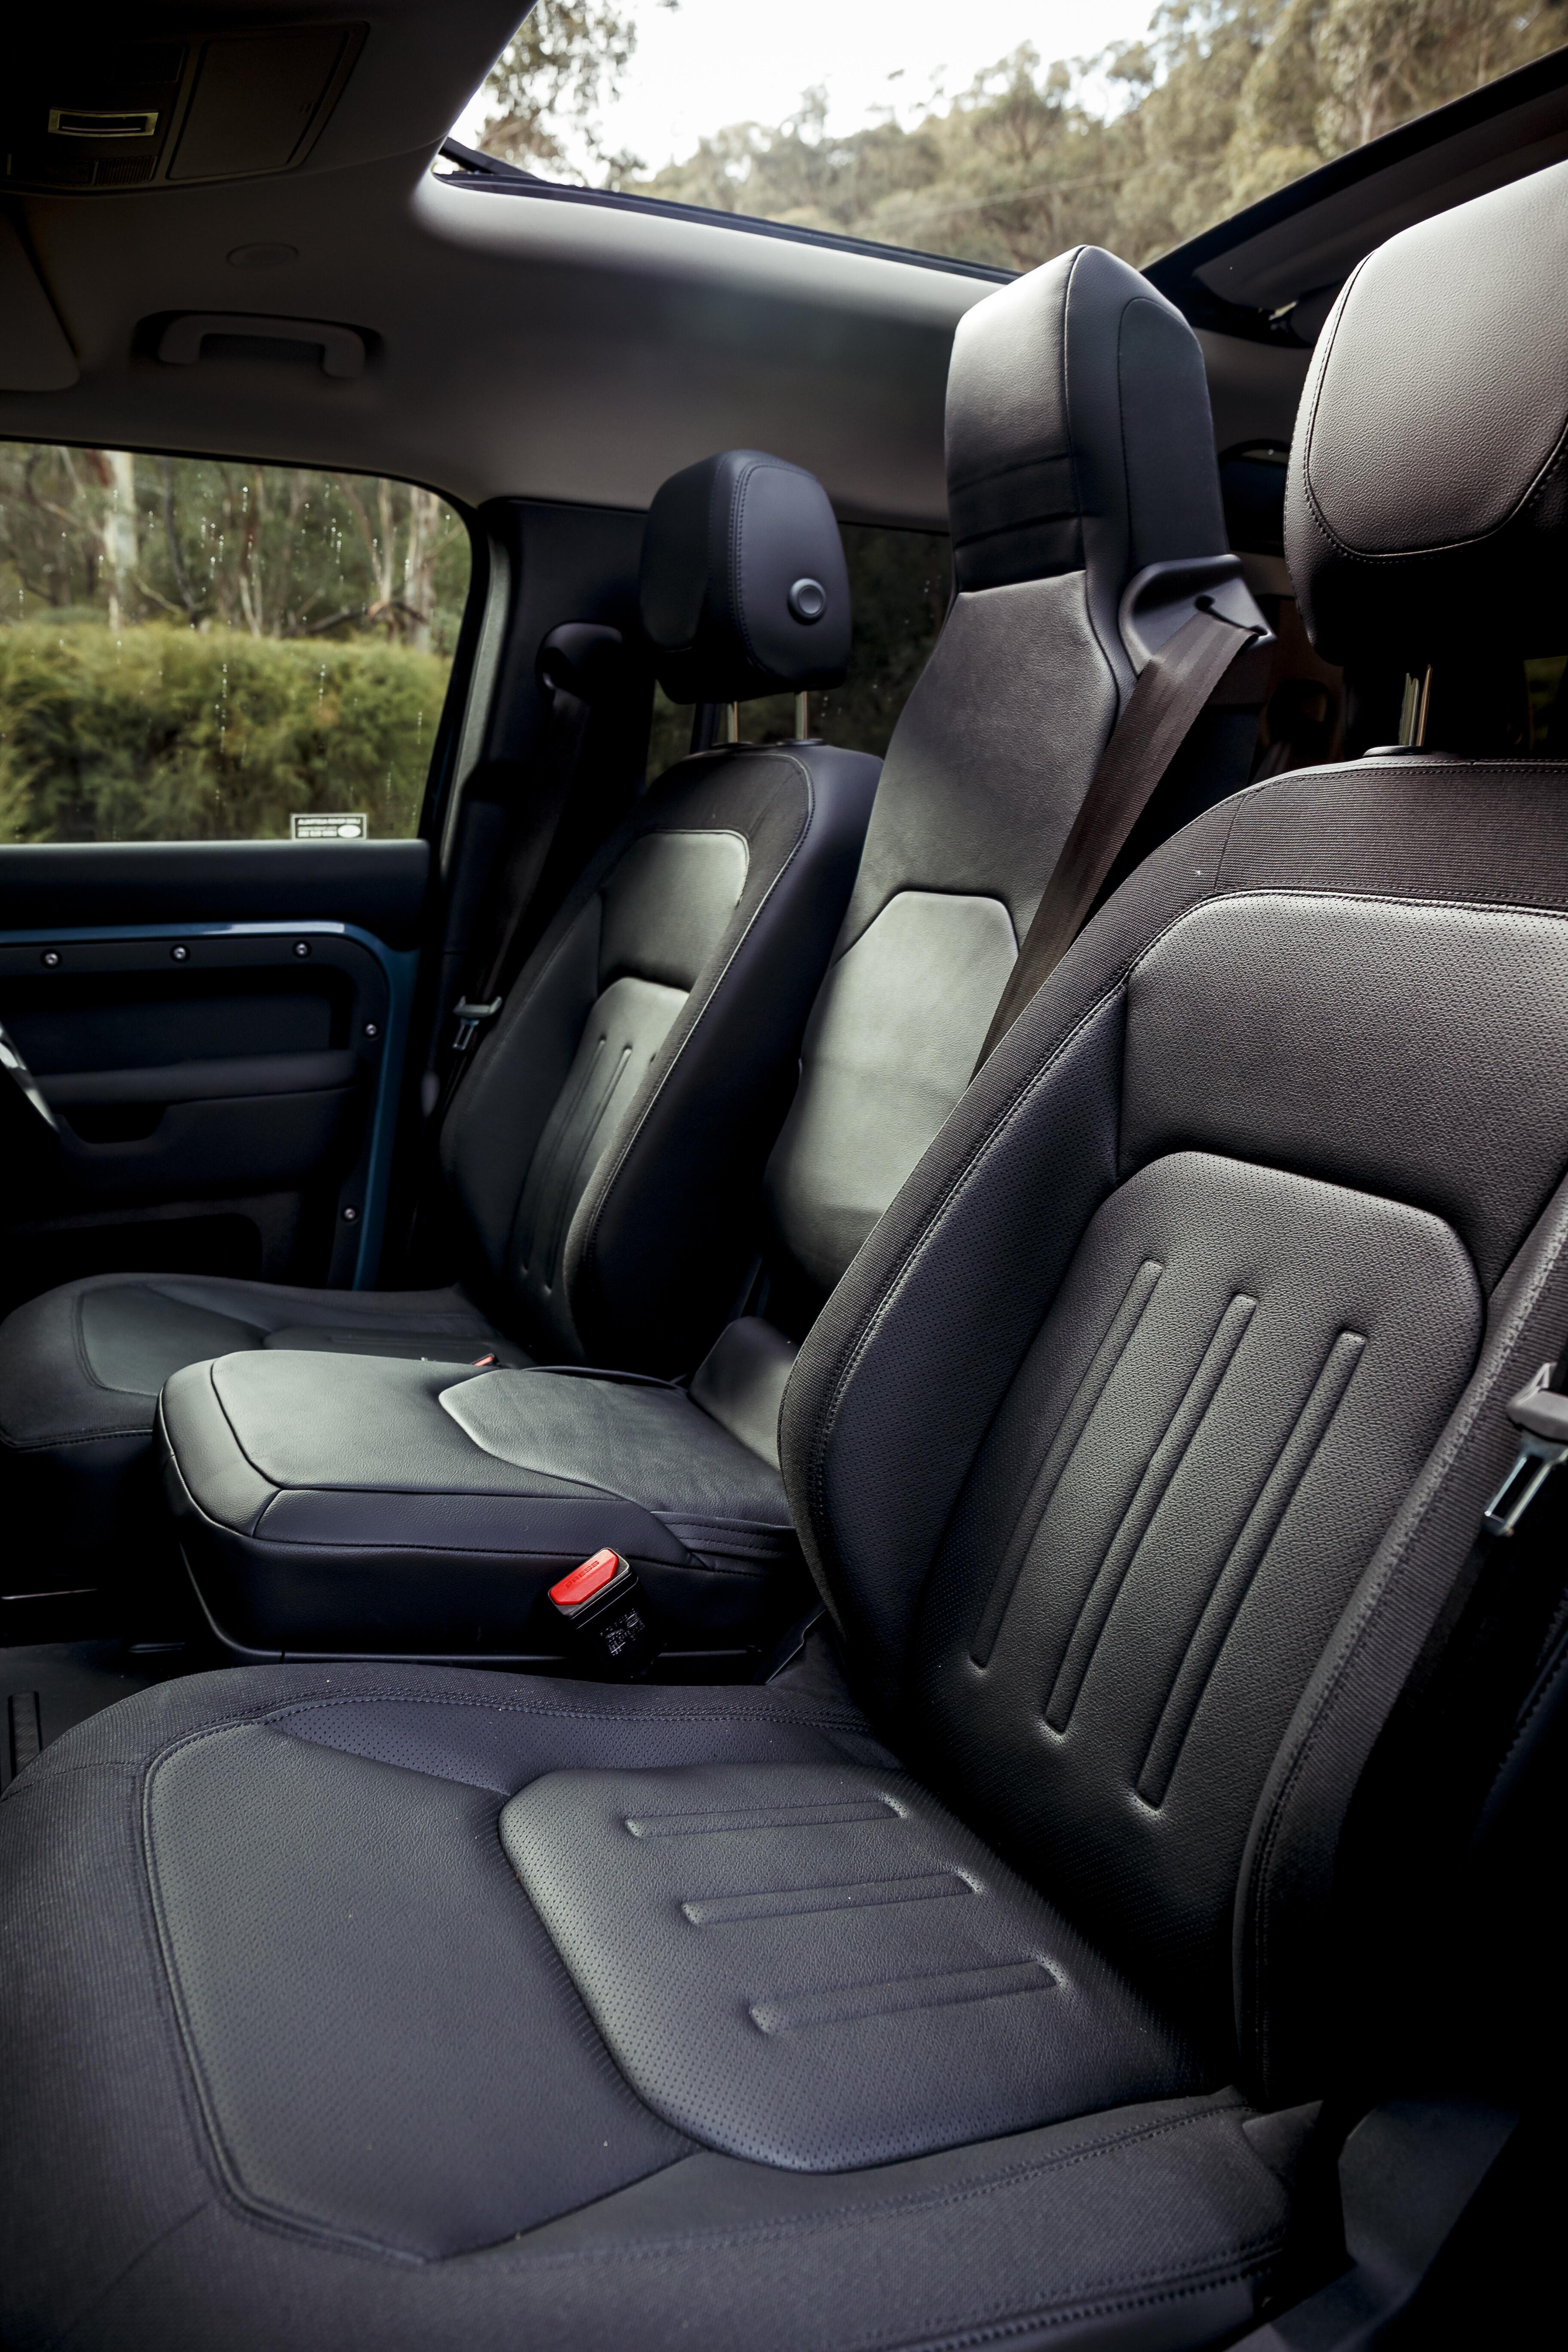 4 X 4 Australia Reviews 2021 June 2021 2021 Land Rover Defender 110 D 250 S Interior 10